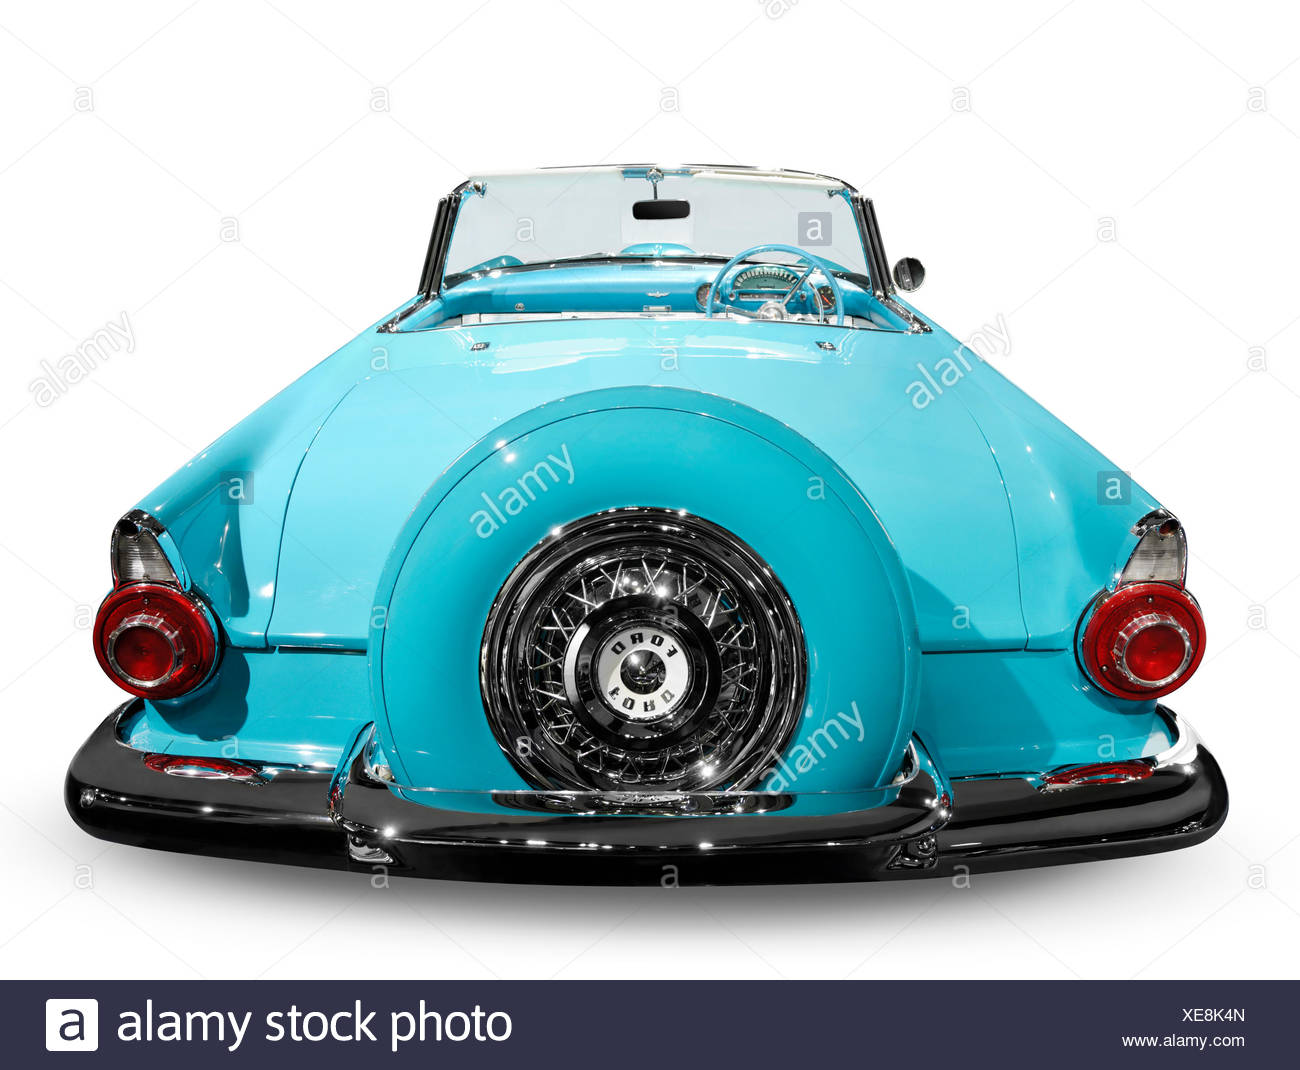 Blue 1956 Ford Thunderbird convertible - Stock Image